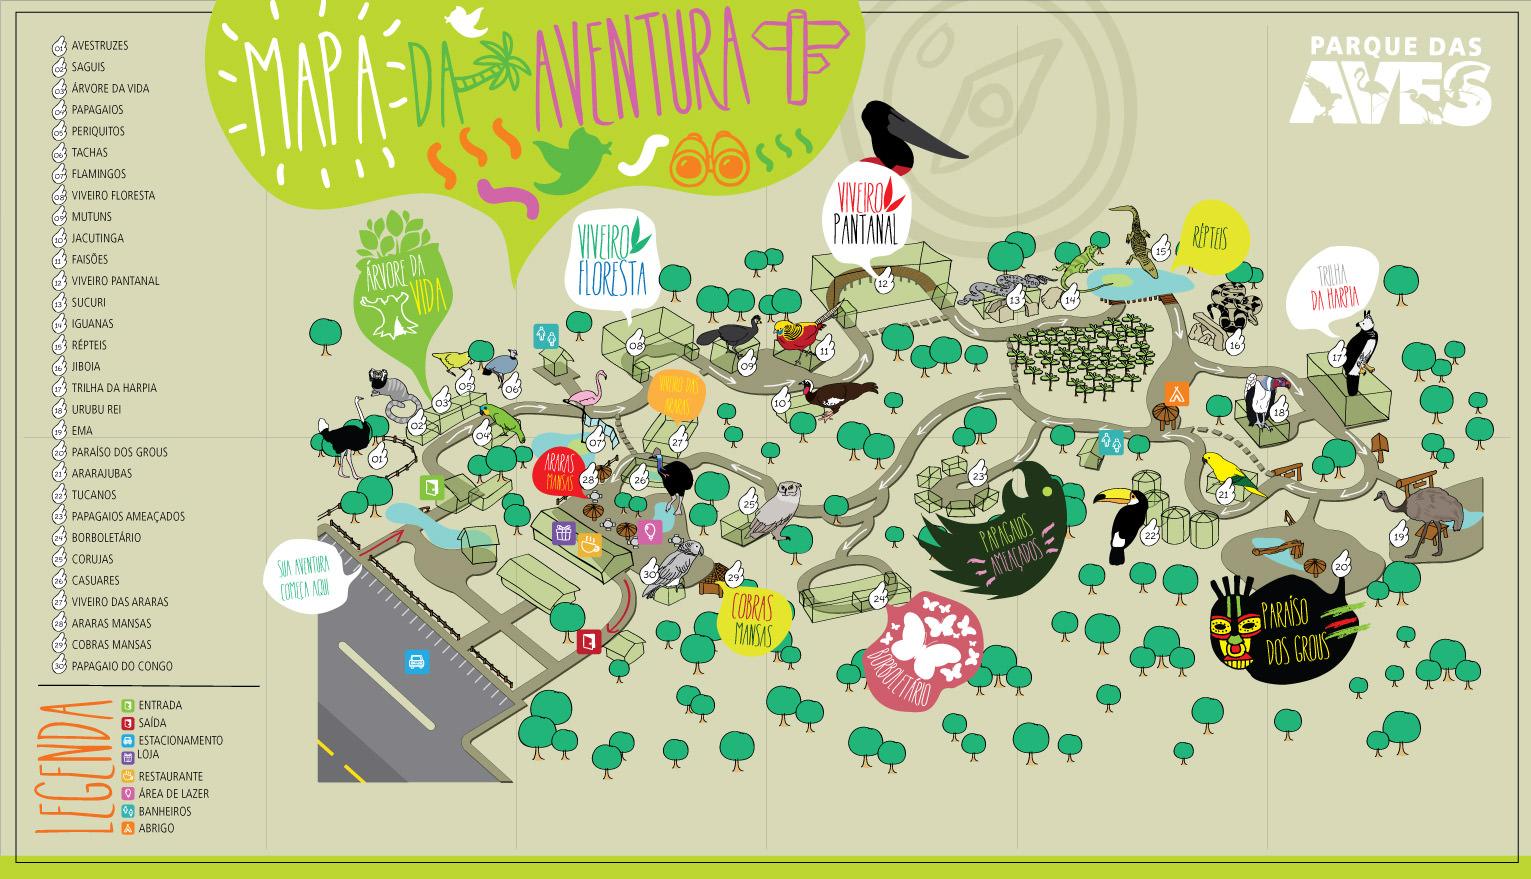 mapa parque das aves